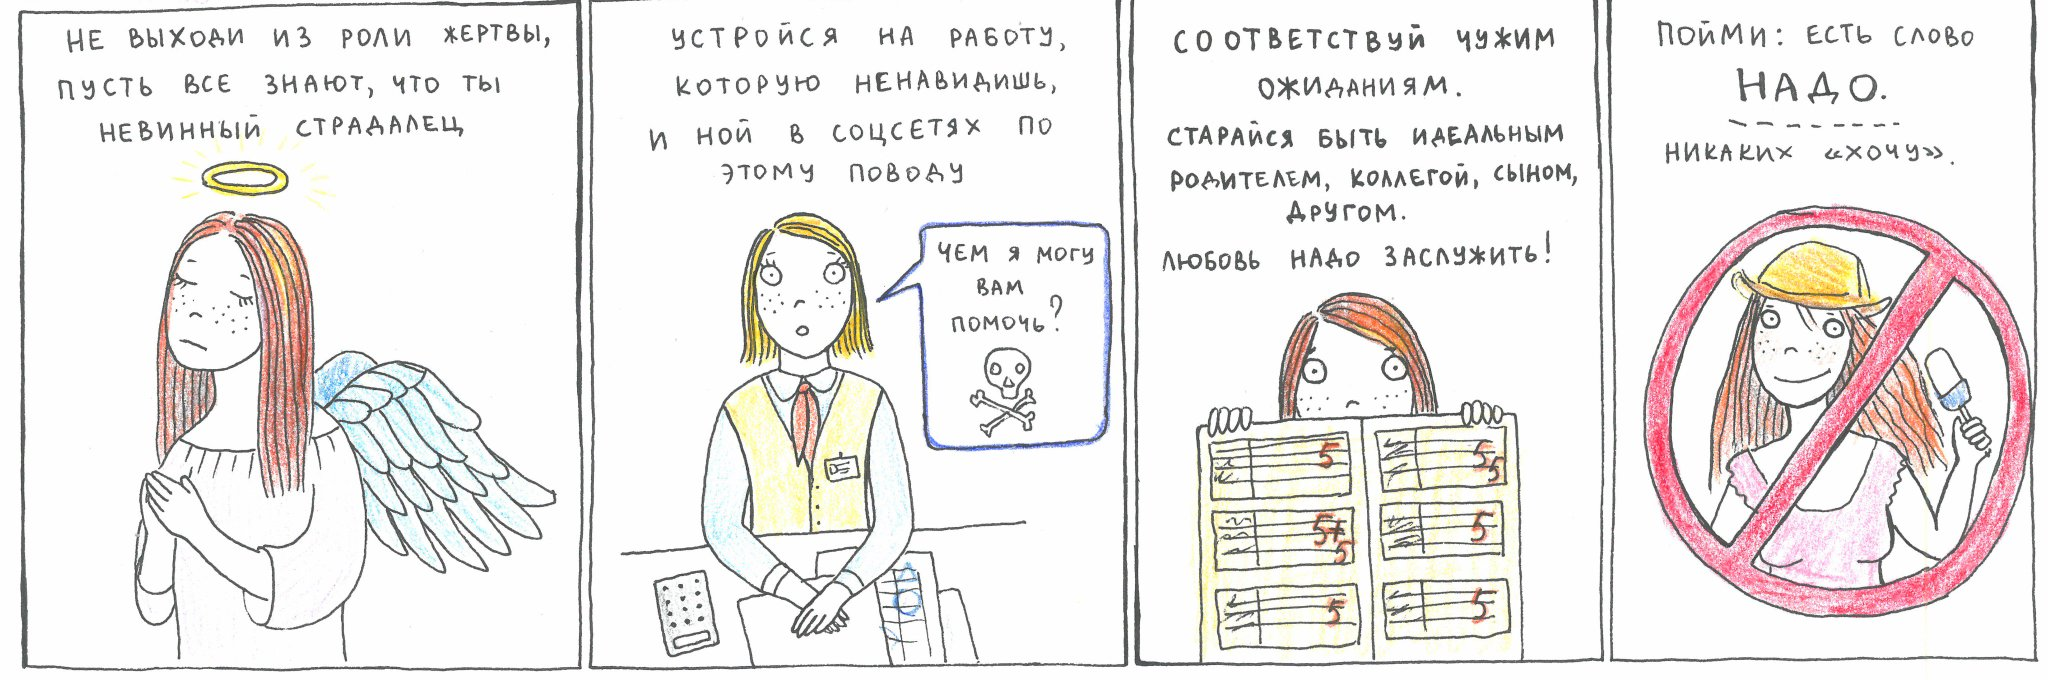 Где деньги, Зин? - МК-Латвия 94